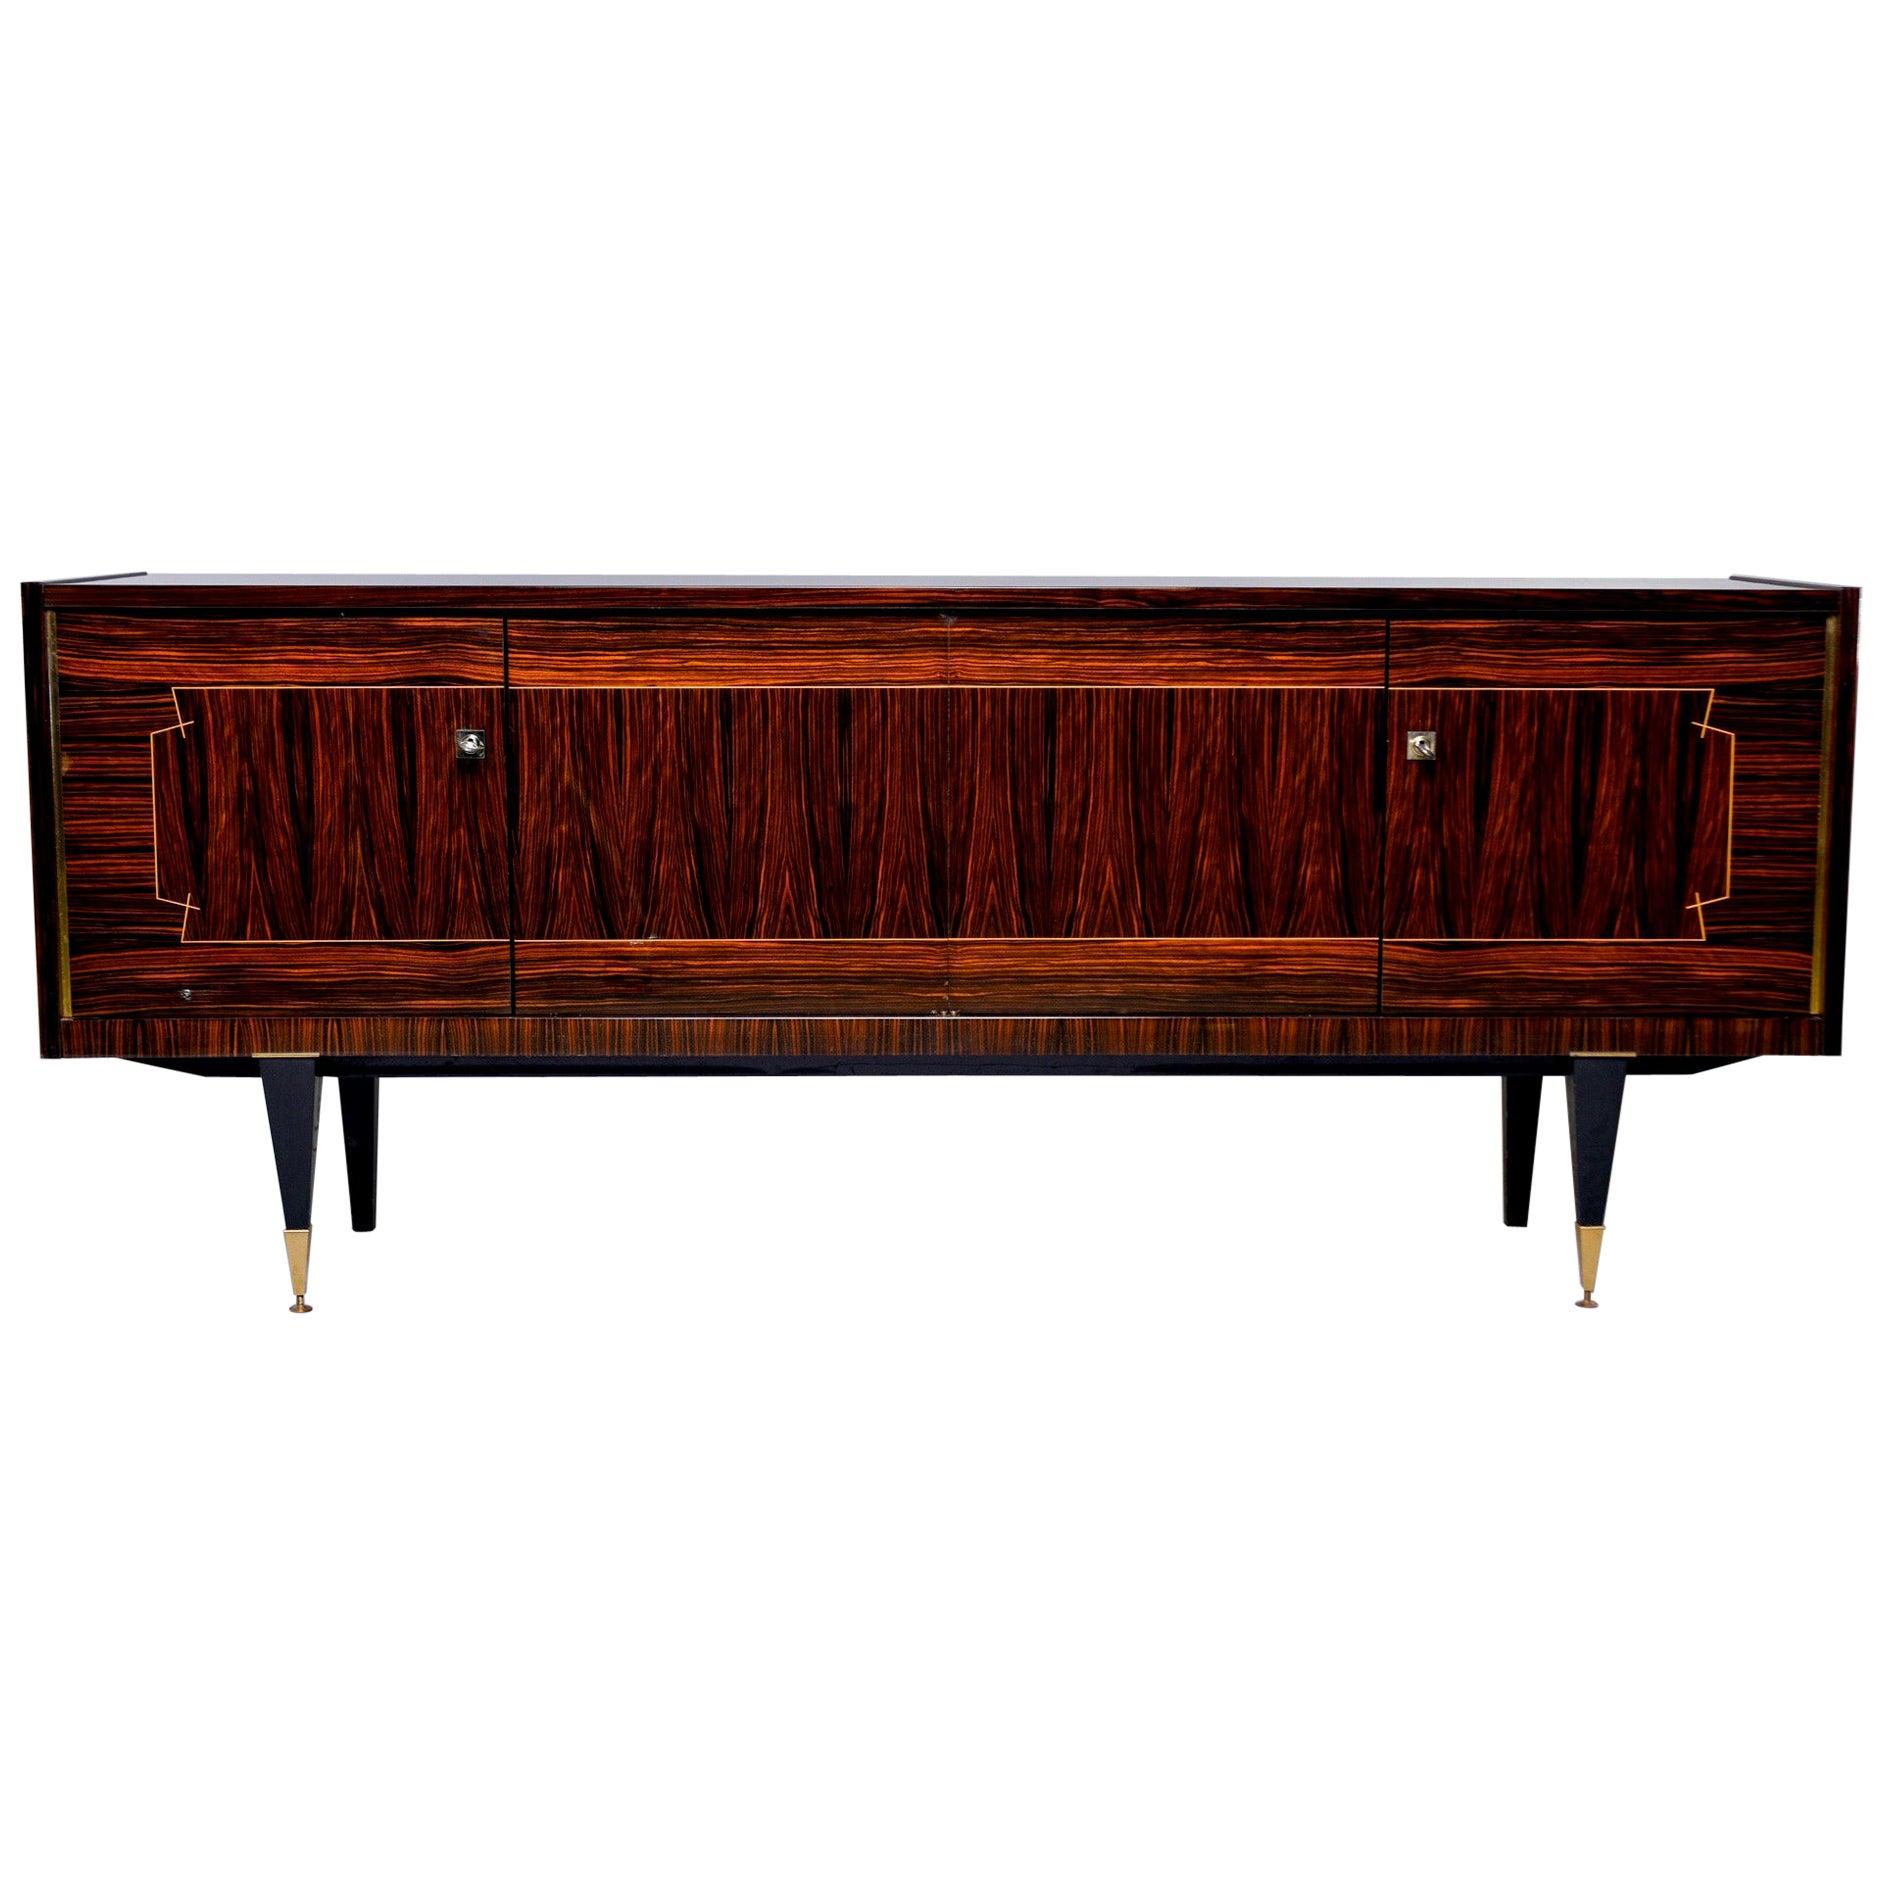 French Art Deco Macassar Buffet or Sideboard